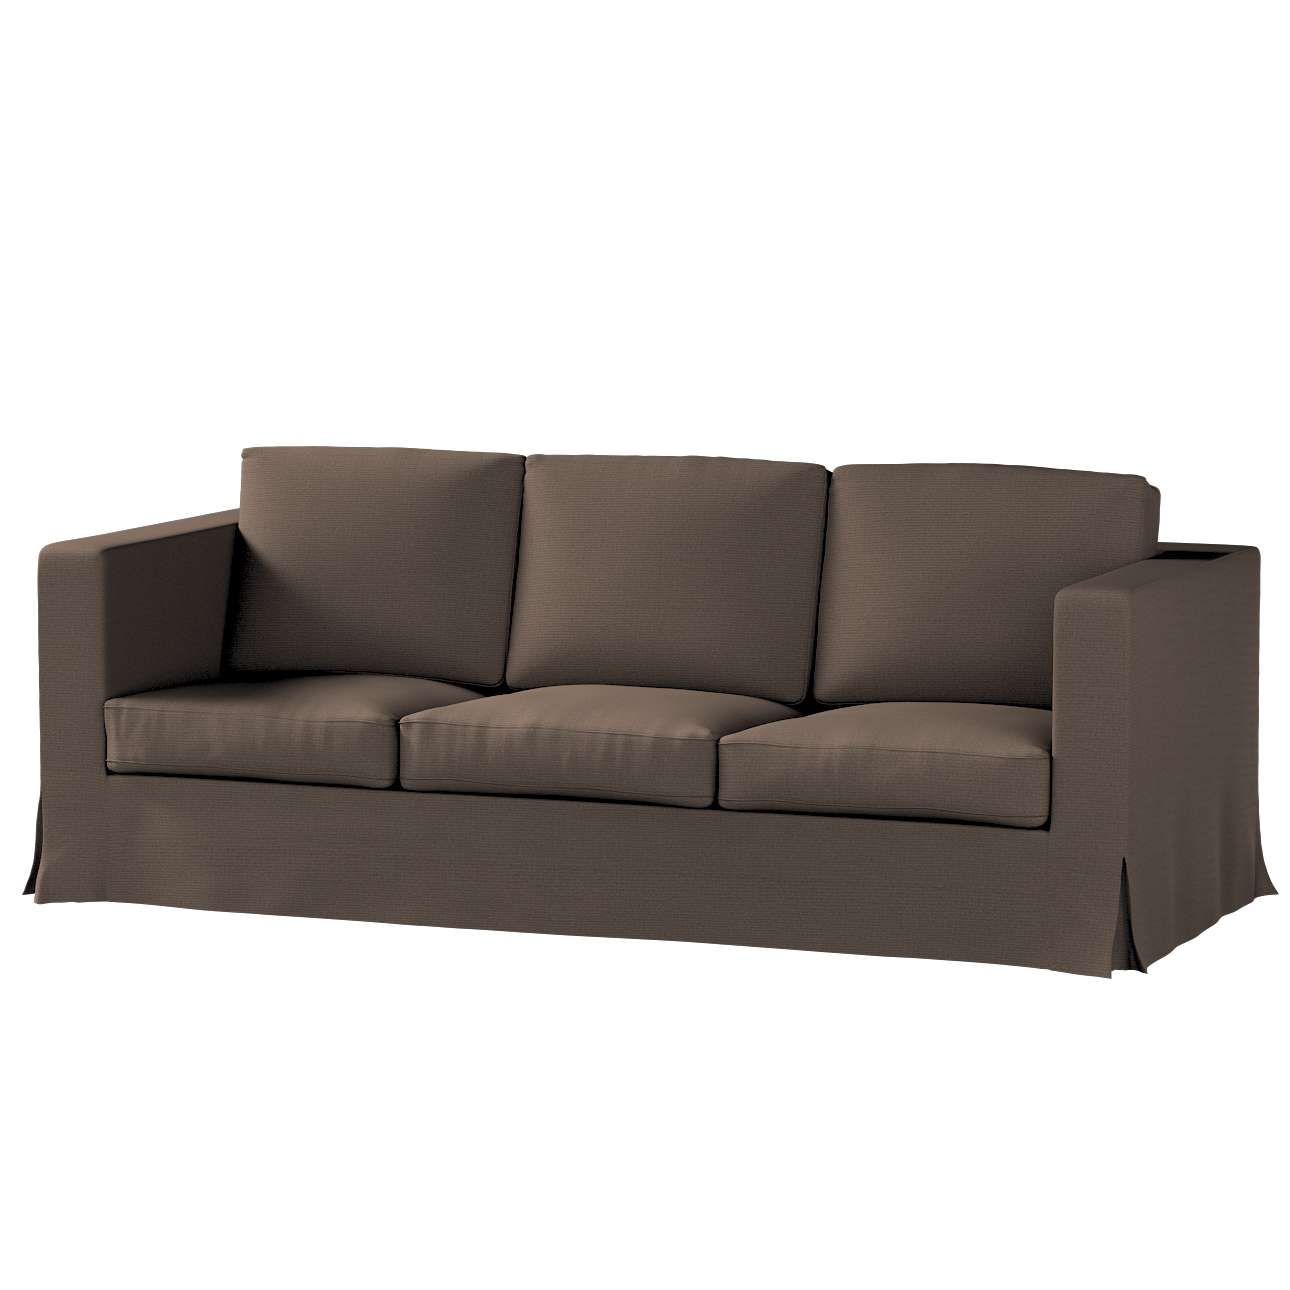 Karlanda 3-Sitzer  Sofabezug nicht ausklappbar lang Sofa Karlanda 3-lang von der Kollektion Etna, Stoff: 705-08